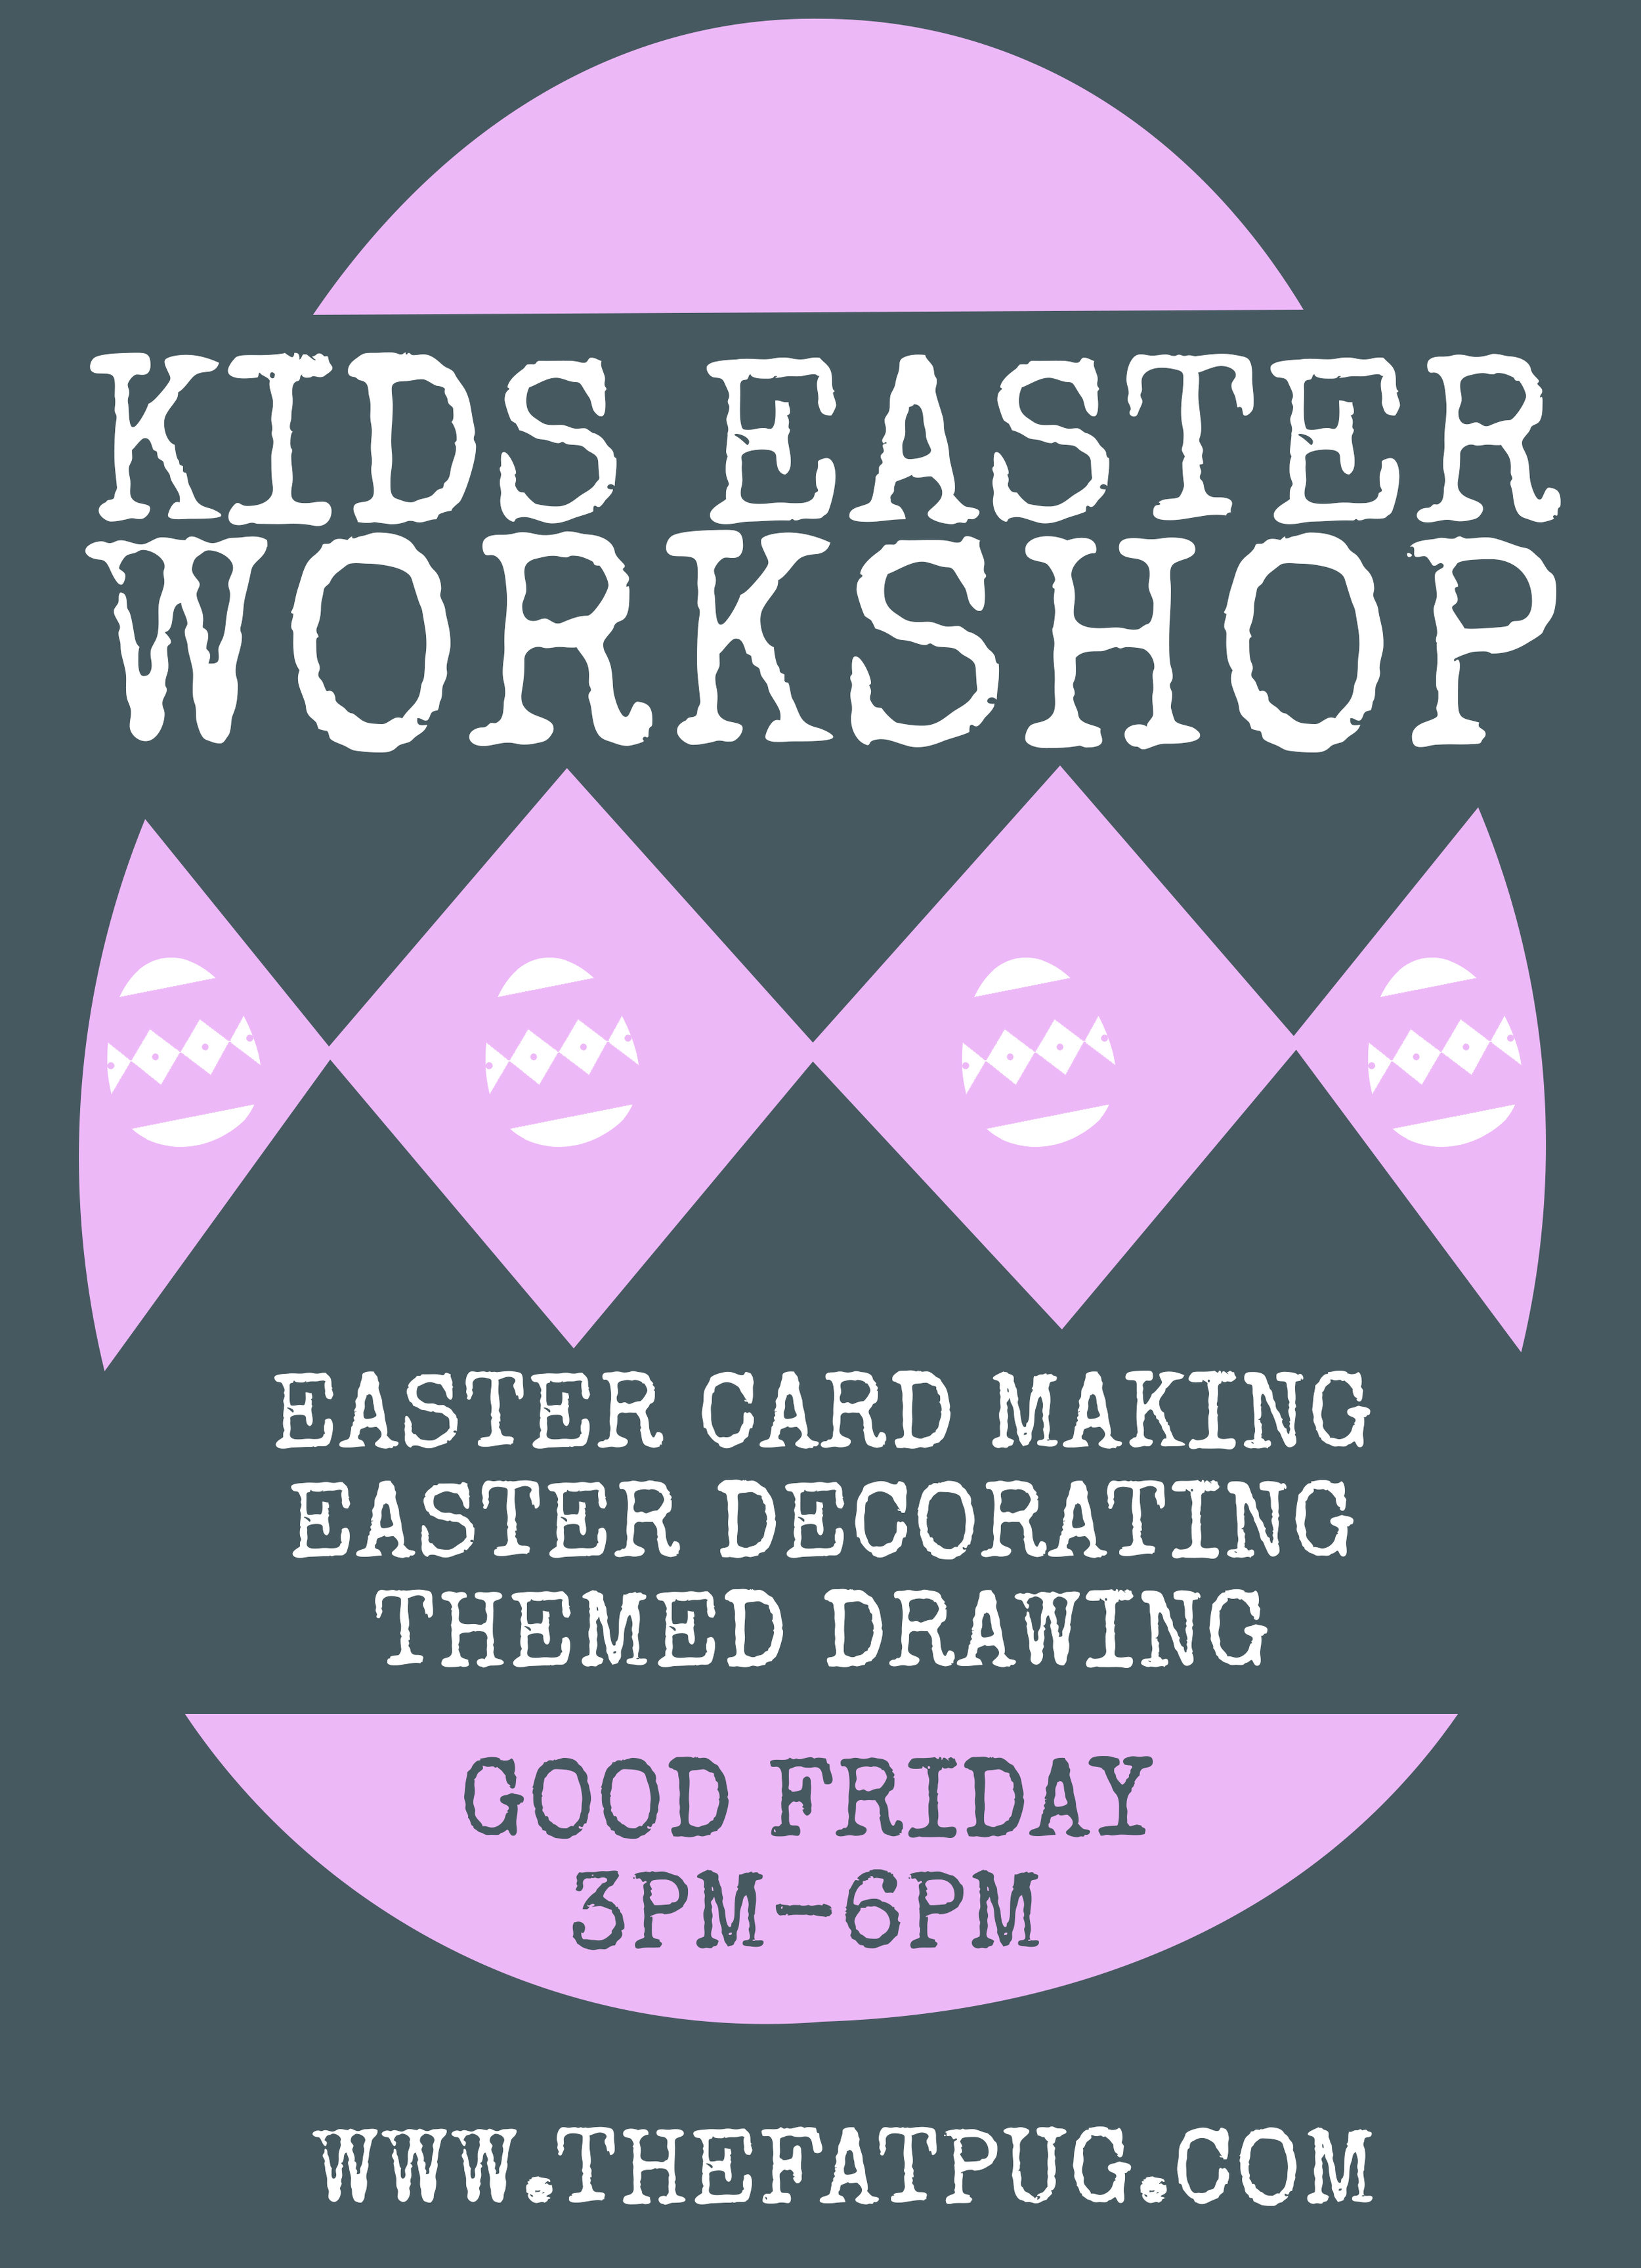 Easter Work shop.jpg